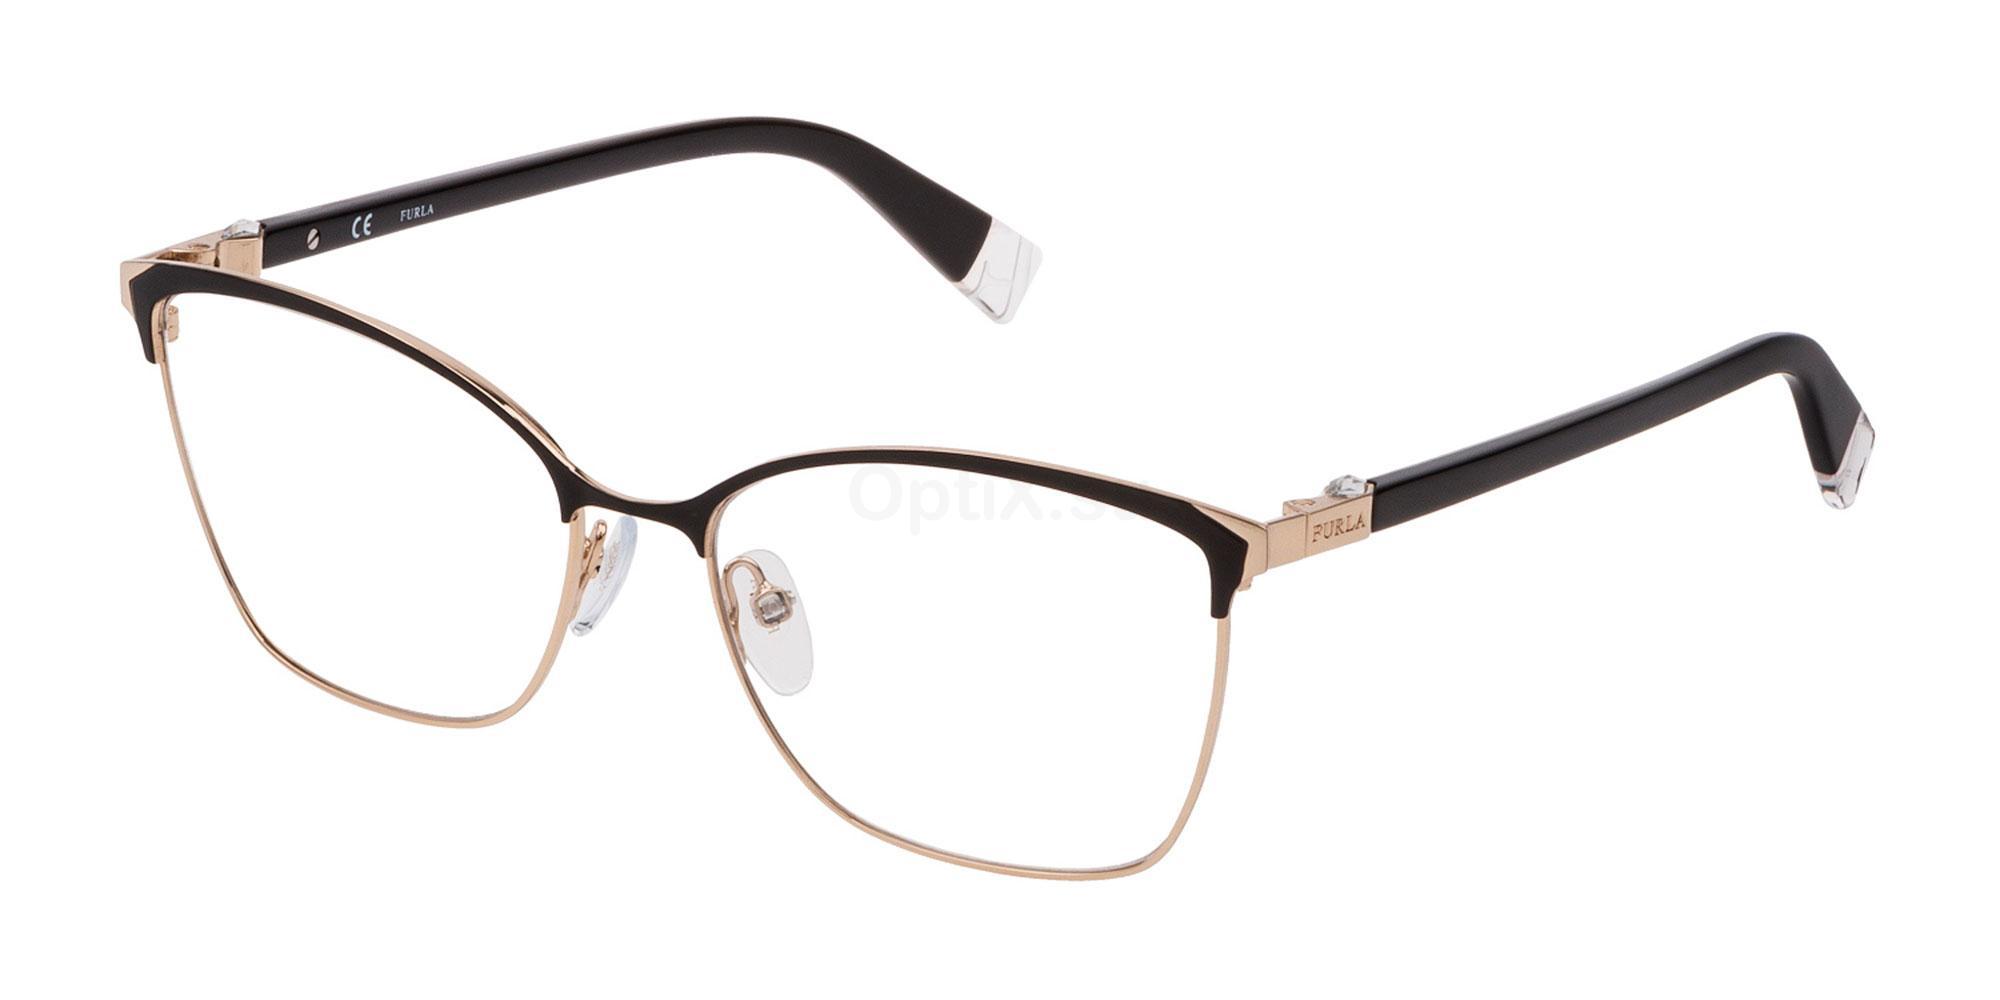 0301 VFU296S Glasses, Furla